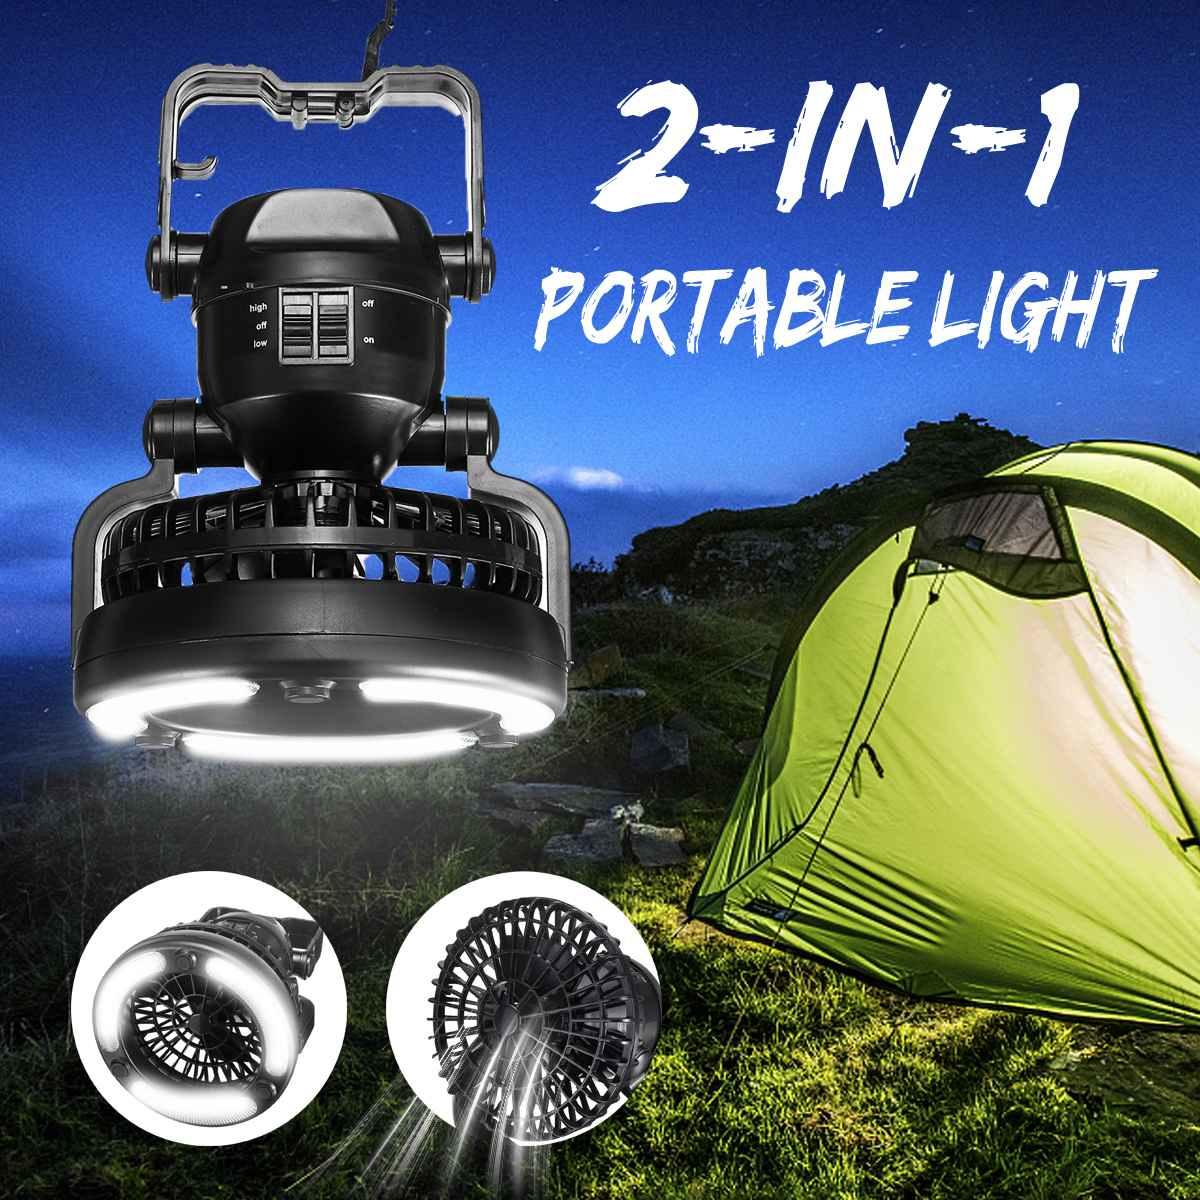 2 Mode 18 LED Tent Light 2 In 1 Camping Ceiling Fan Light Hanging Tent Lamp Lantern Outdoor Tent Light Fan2 Mode 18 LED Tent Light 2 In 1 Camping Ceiling Fan Light Hanging Tent Lamp Lantern Outdoor Tent Light Fan